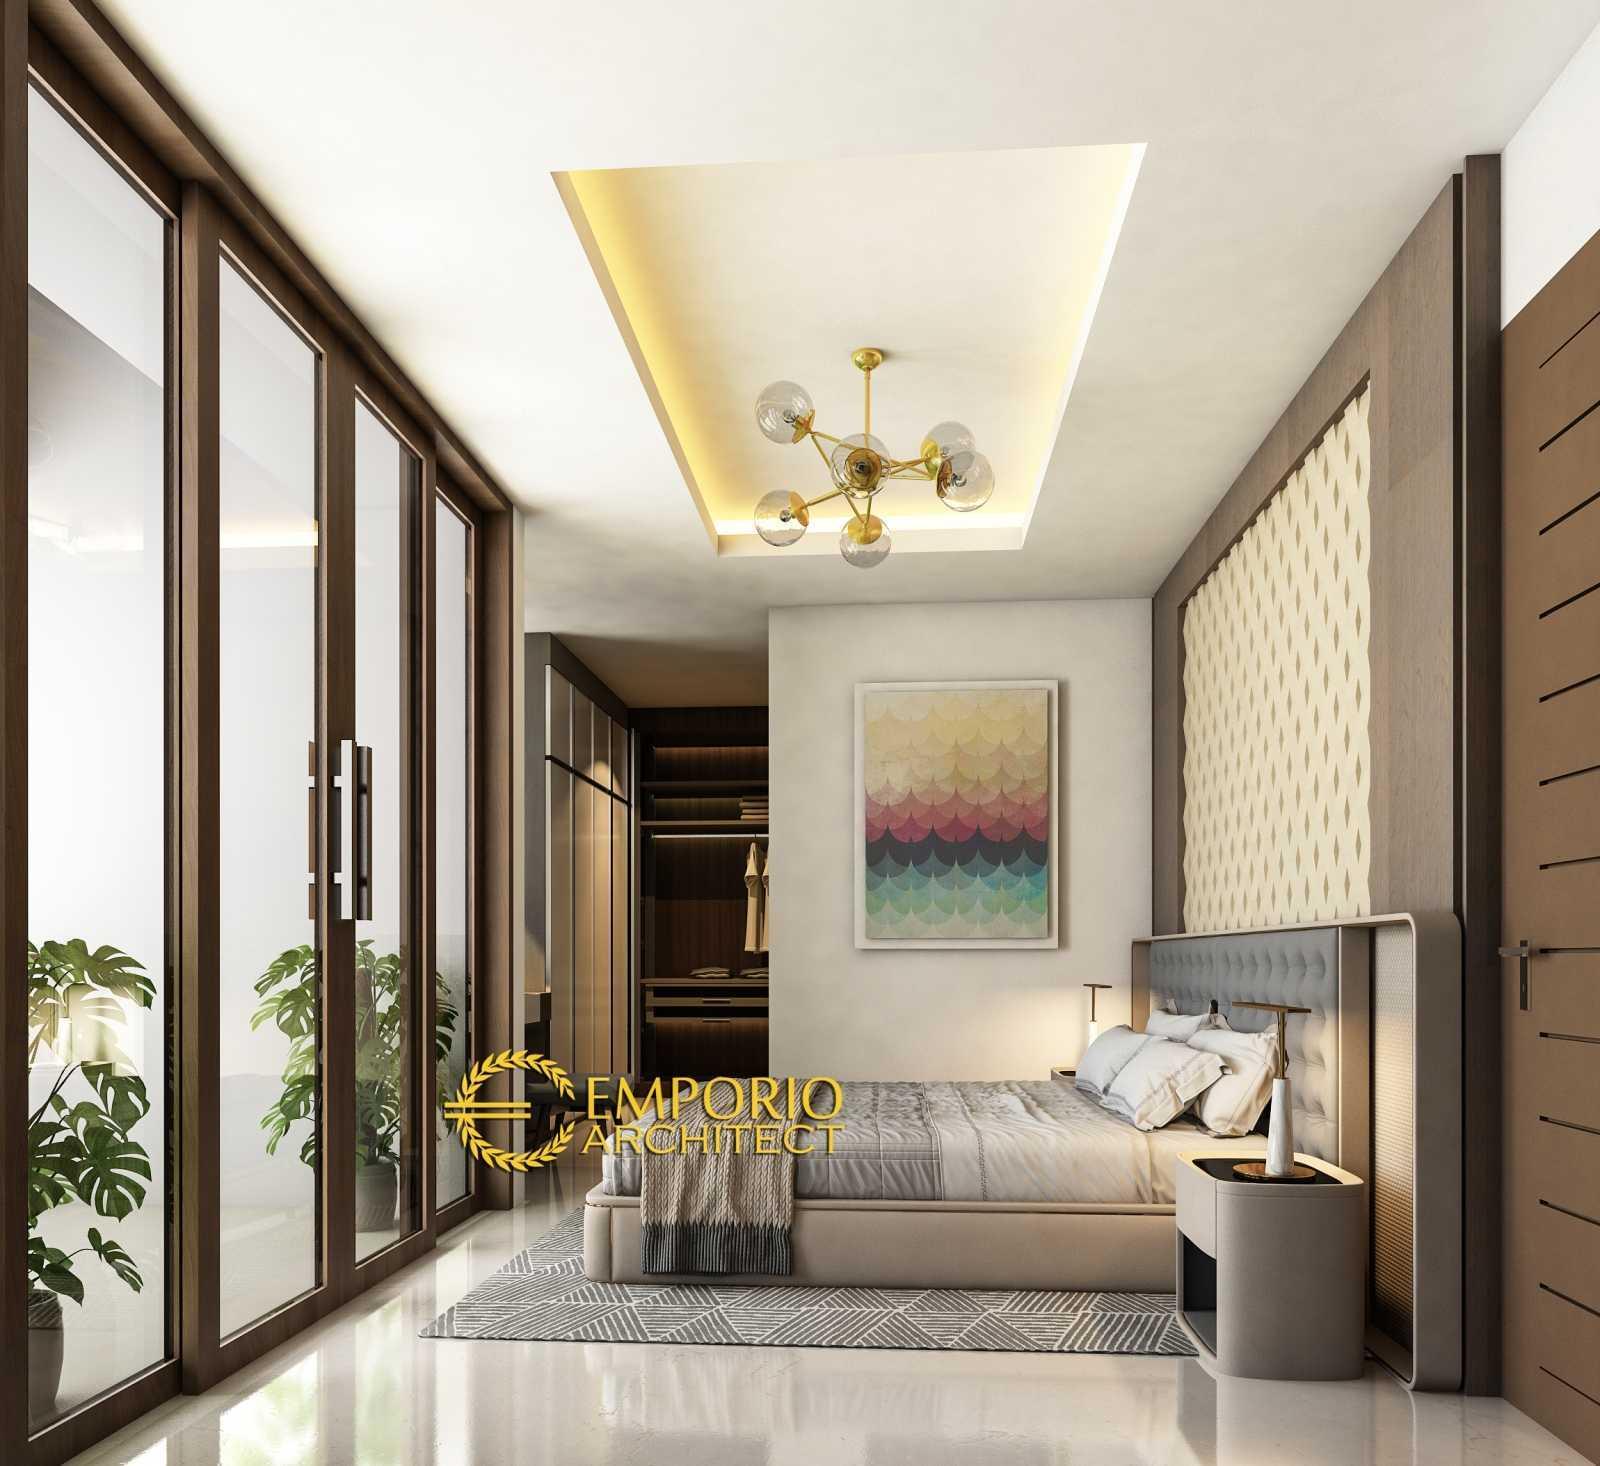 Emporio Architect Desain Rumah Villa Bali Tropis 573 @ Bogor Bogor, Jawa Barat, Indonesia Bogor, Jawa Barat, Indonesia Emporio-Architect-Desain-Rumah-Villa-Bali-Tropis-573-Bogor  74223